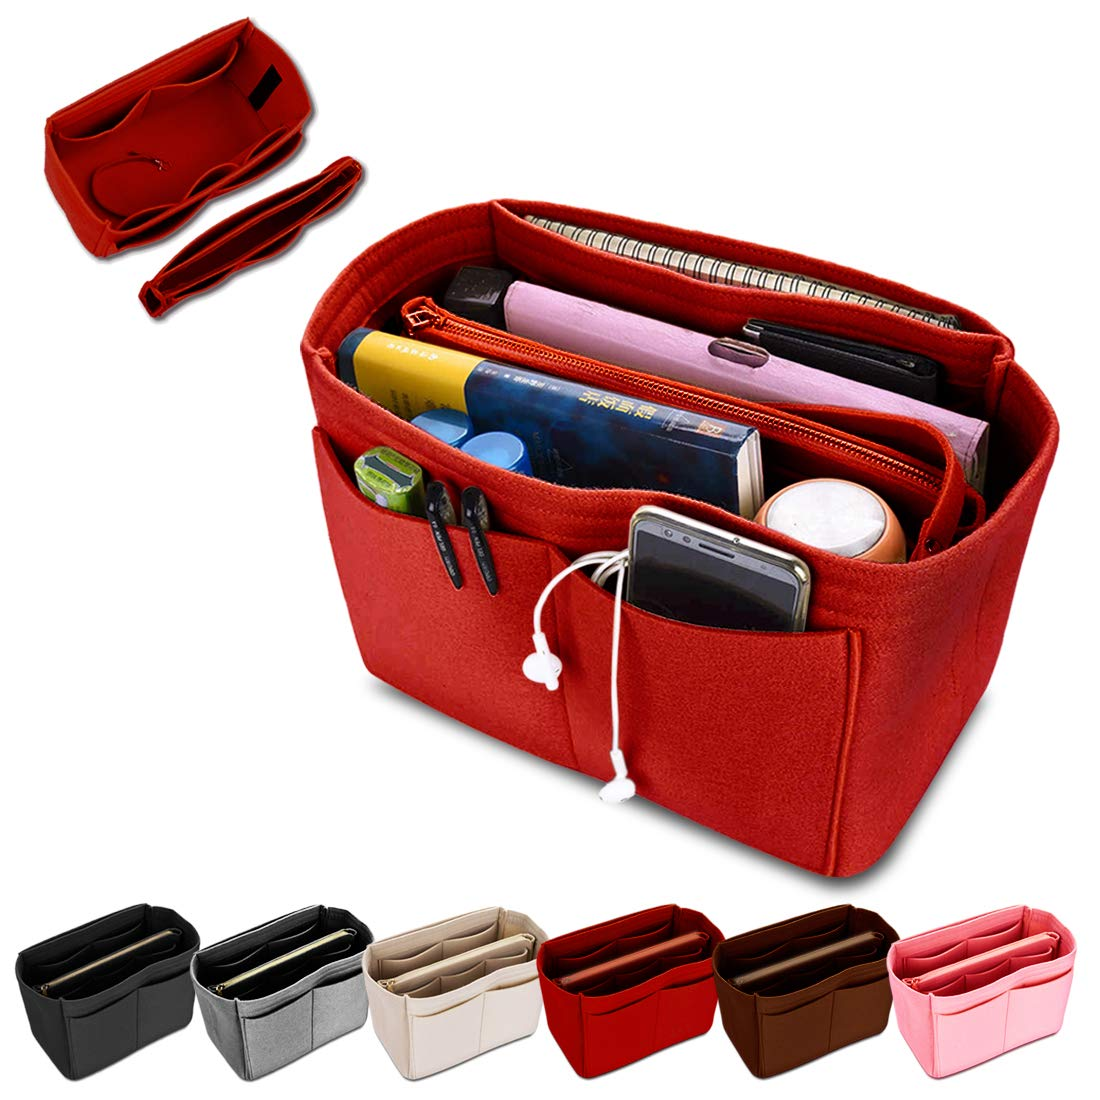 KINGDOO Felt Purse Organizer Insert Bag Organizer Handbag Tote Bag in Bag Fits for Speedy, Neverfull, Longchamp (M, Red) by KINGDOO